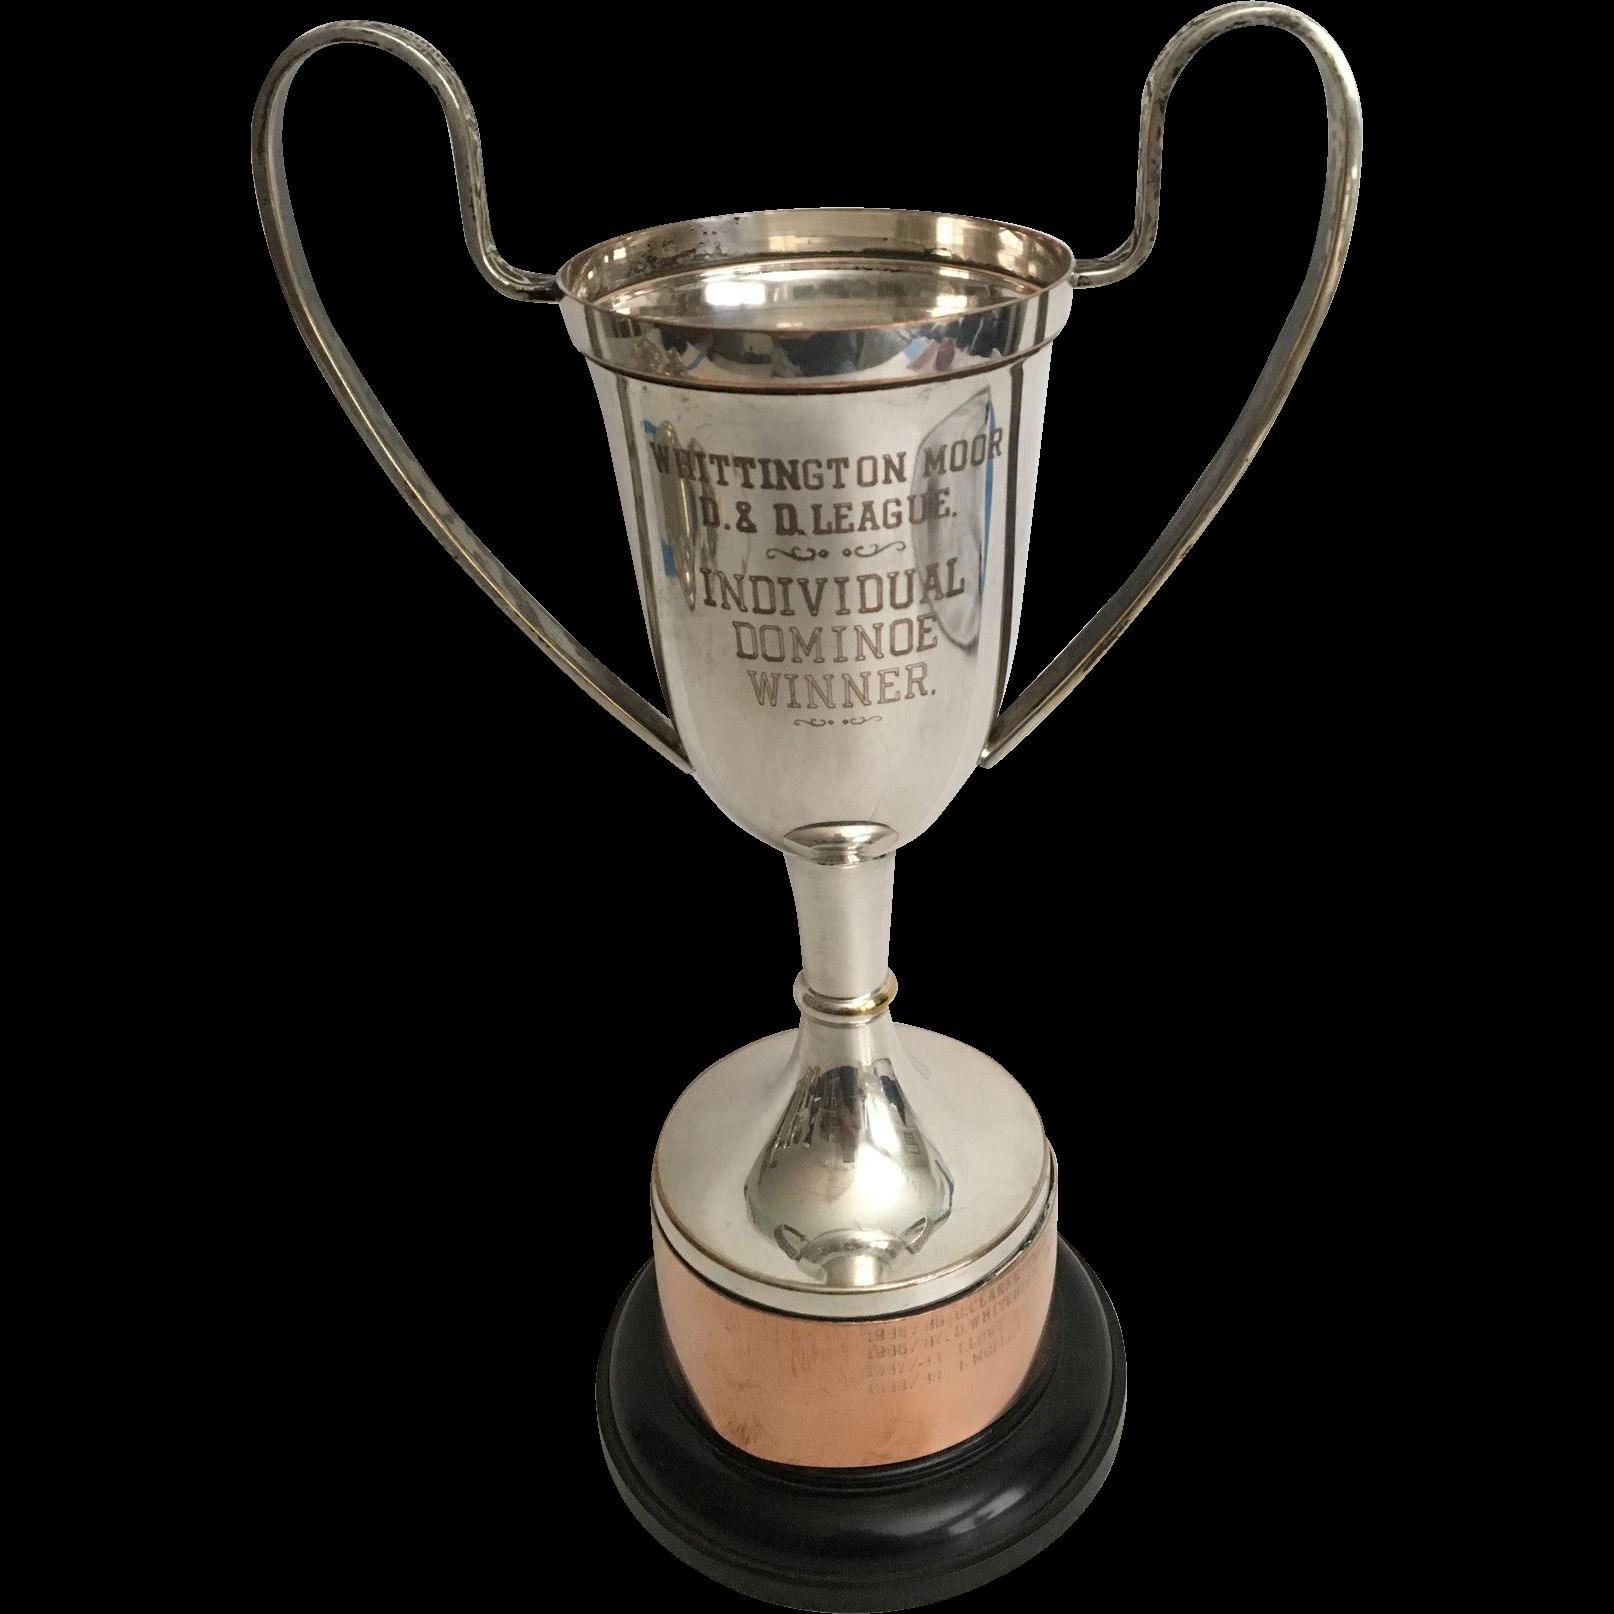 English Dominoes Winner Trophy